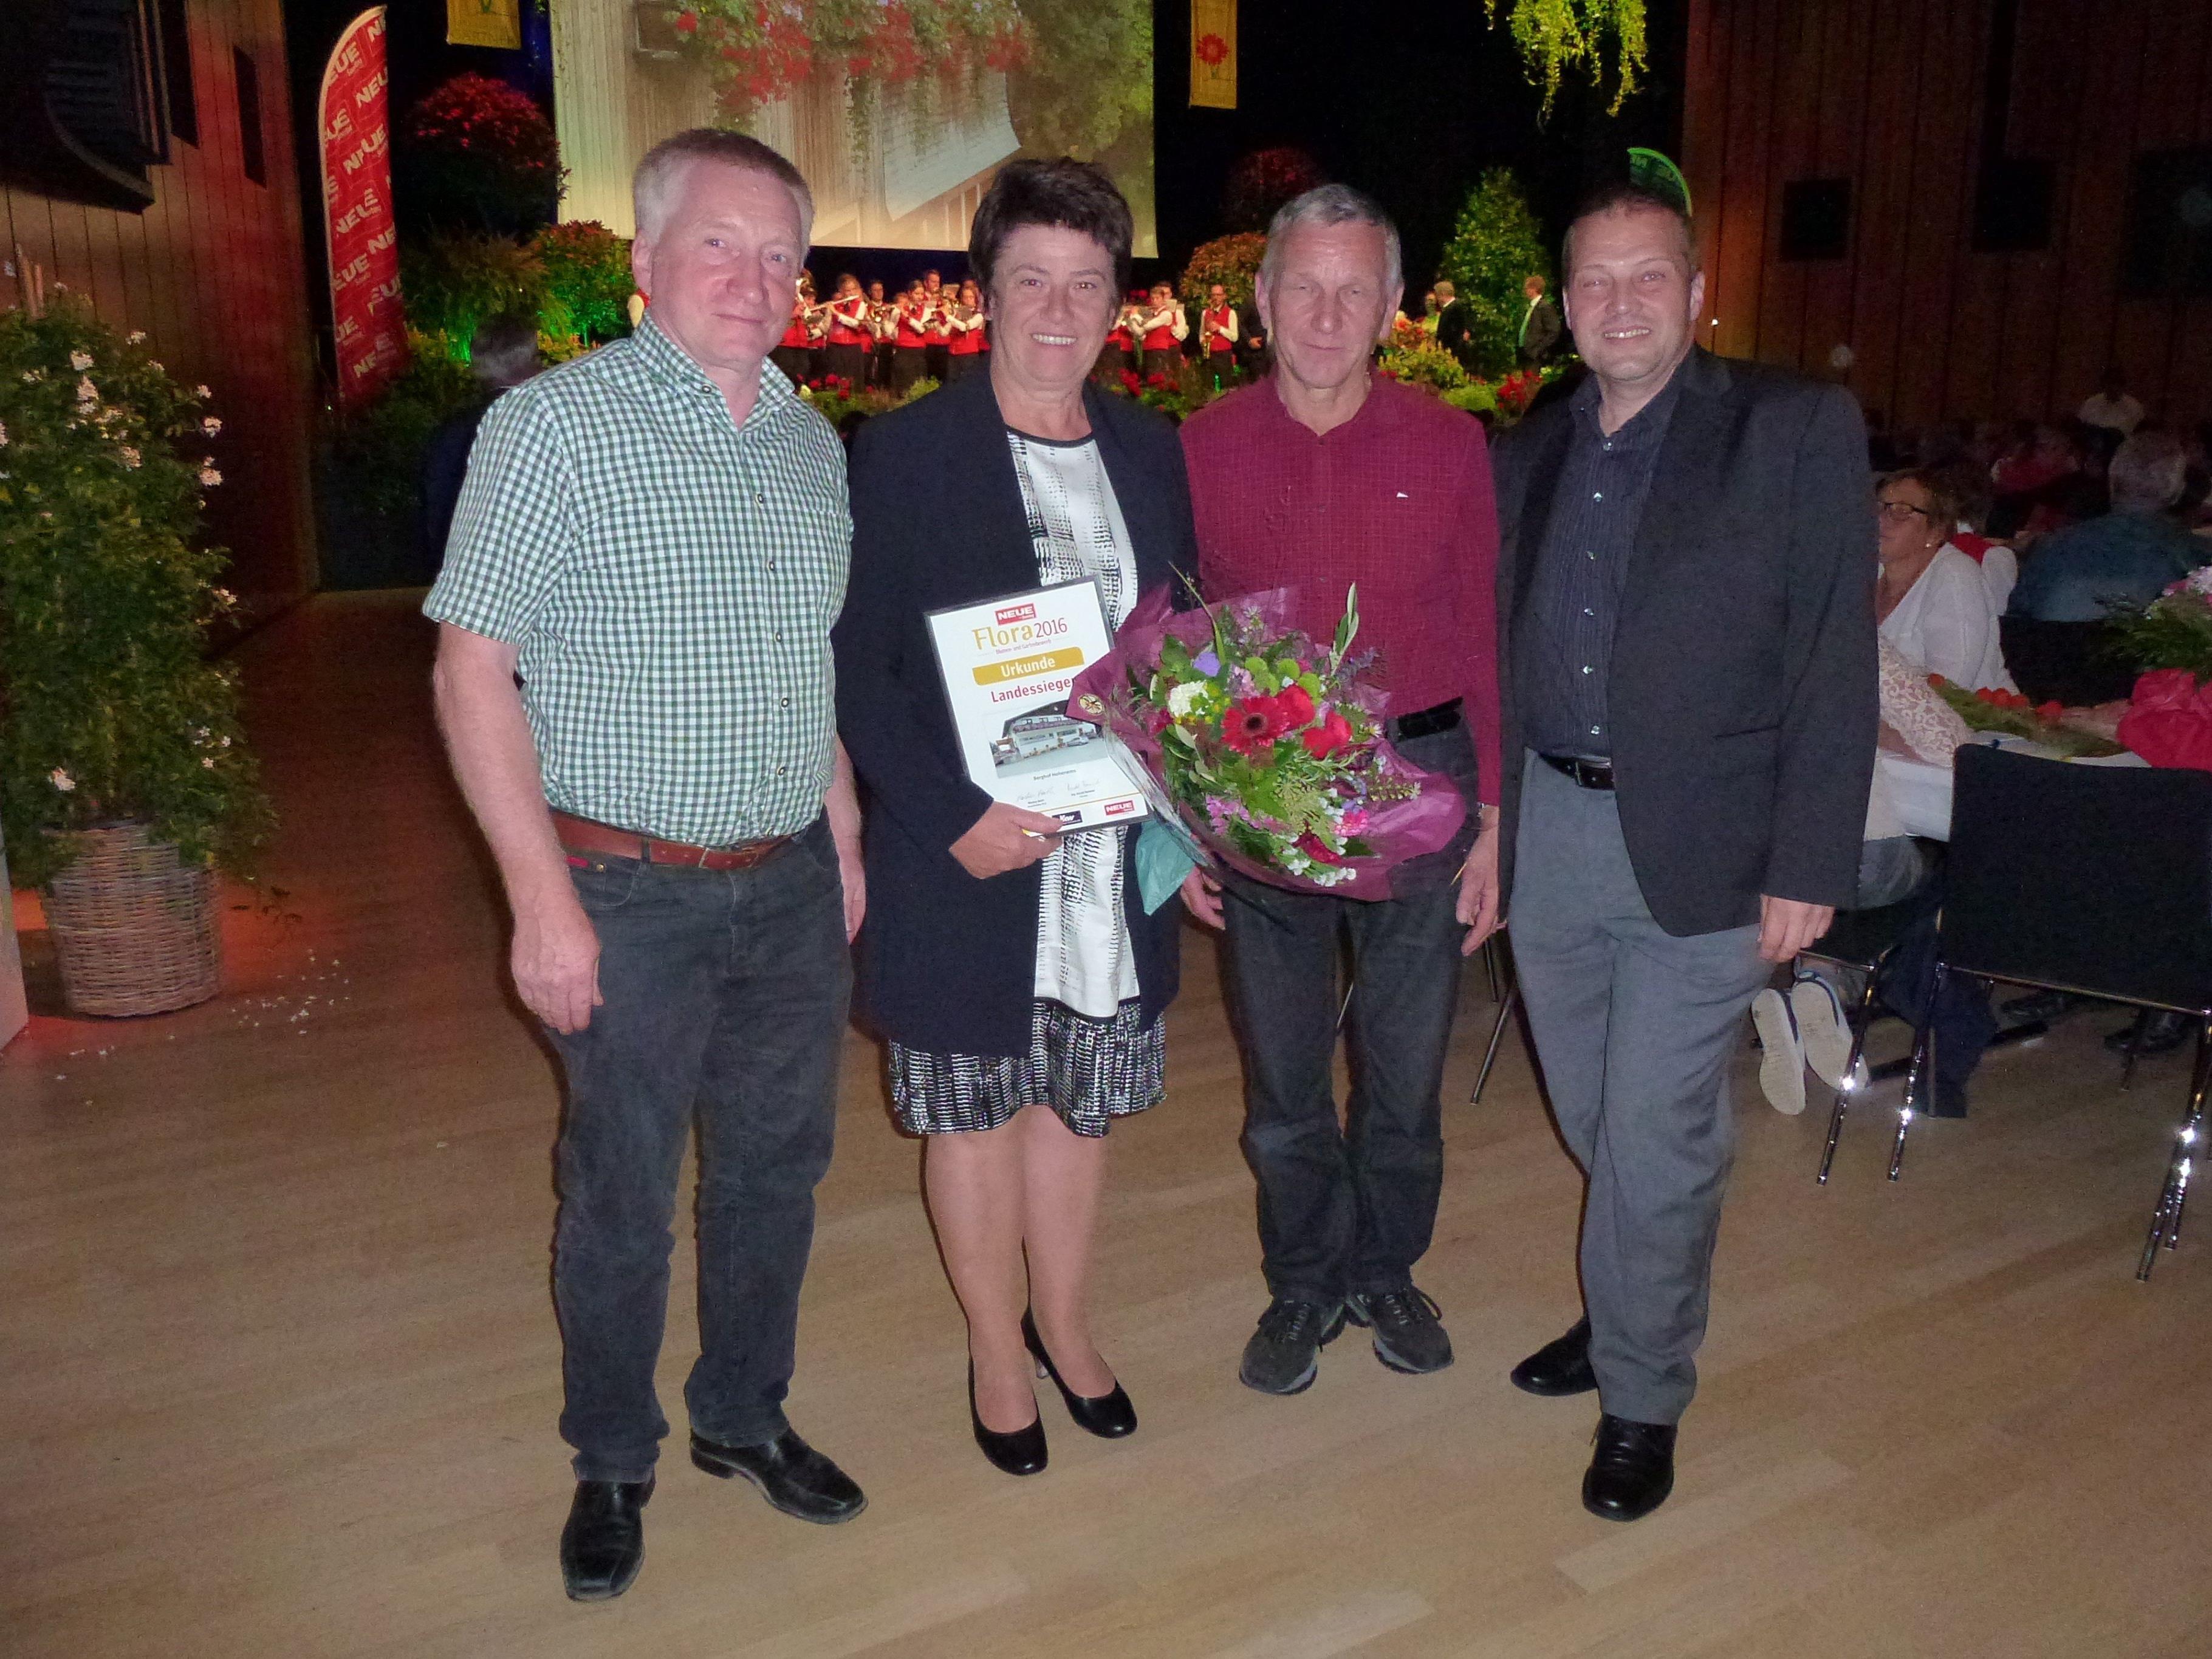 Hermann Klien, Edith Mathis, Gebhard Linder, Günter Mathis